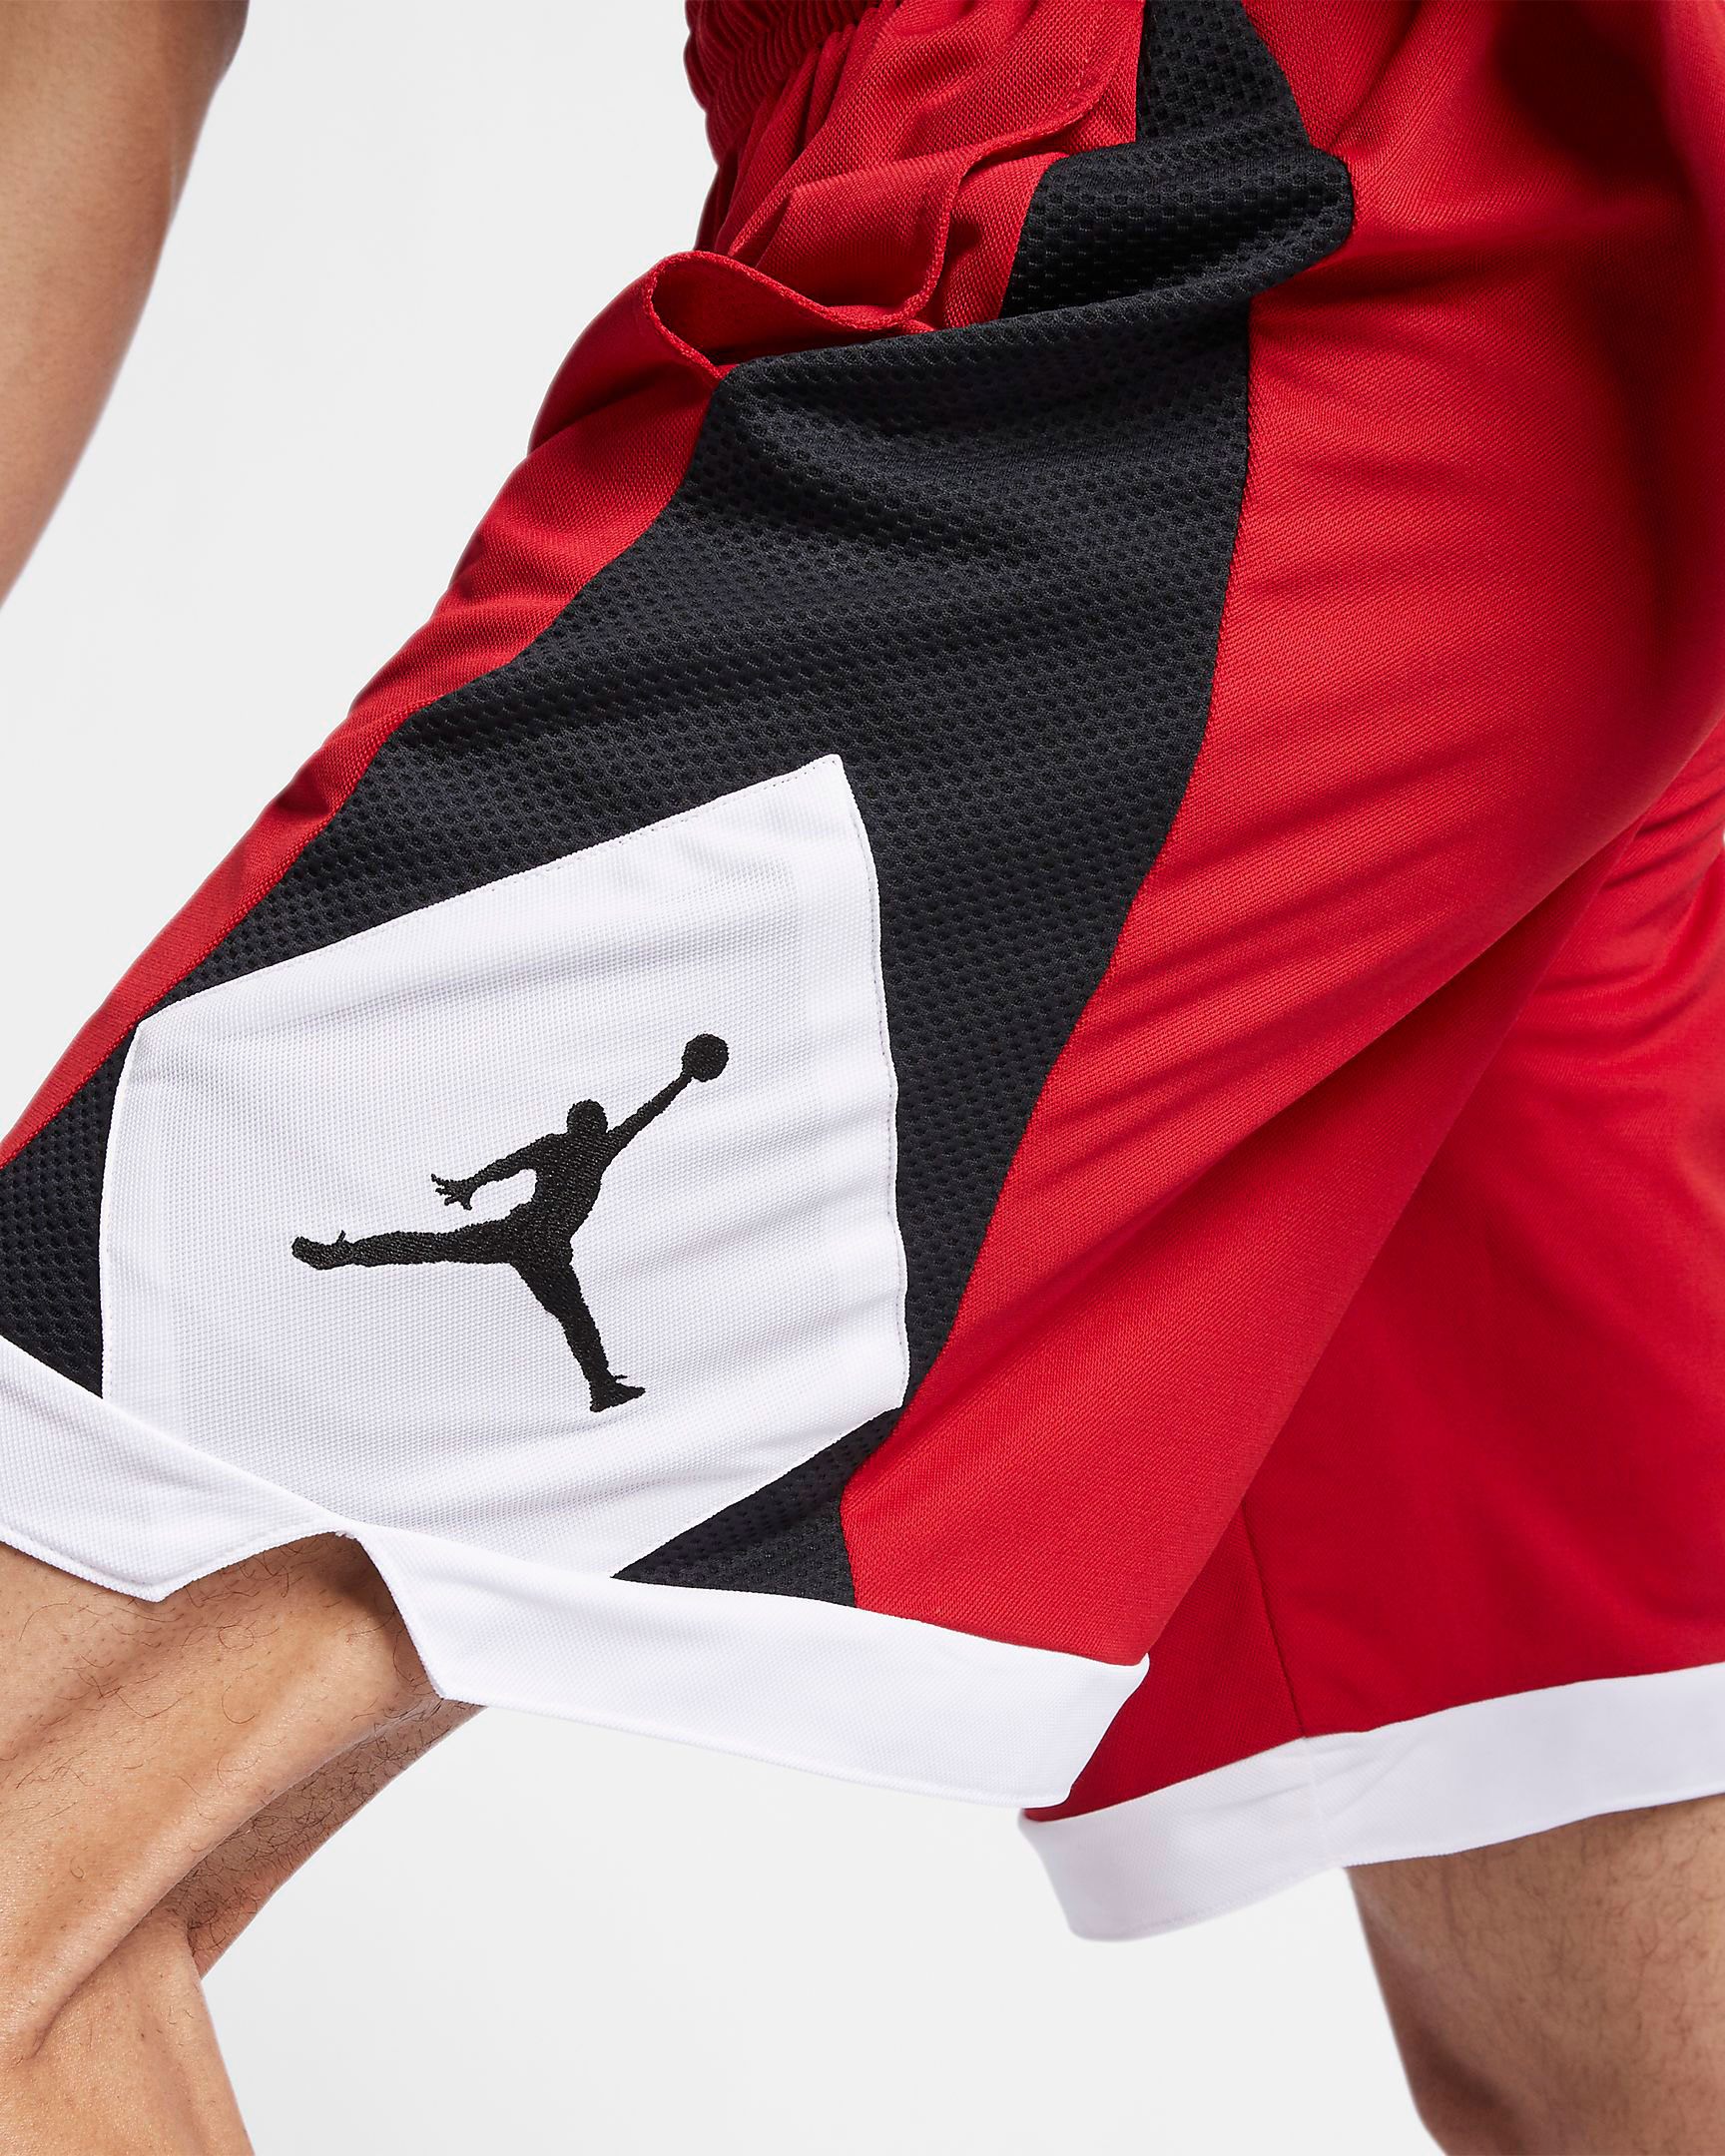 air-jordan-3-tinker-air-max-1-shorts-match-1